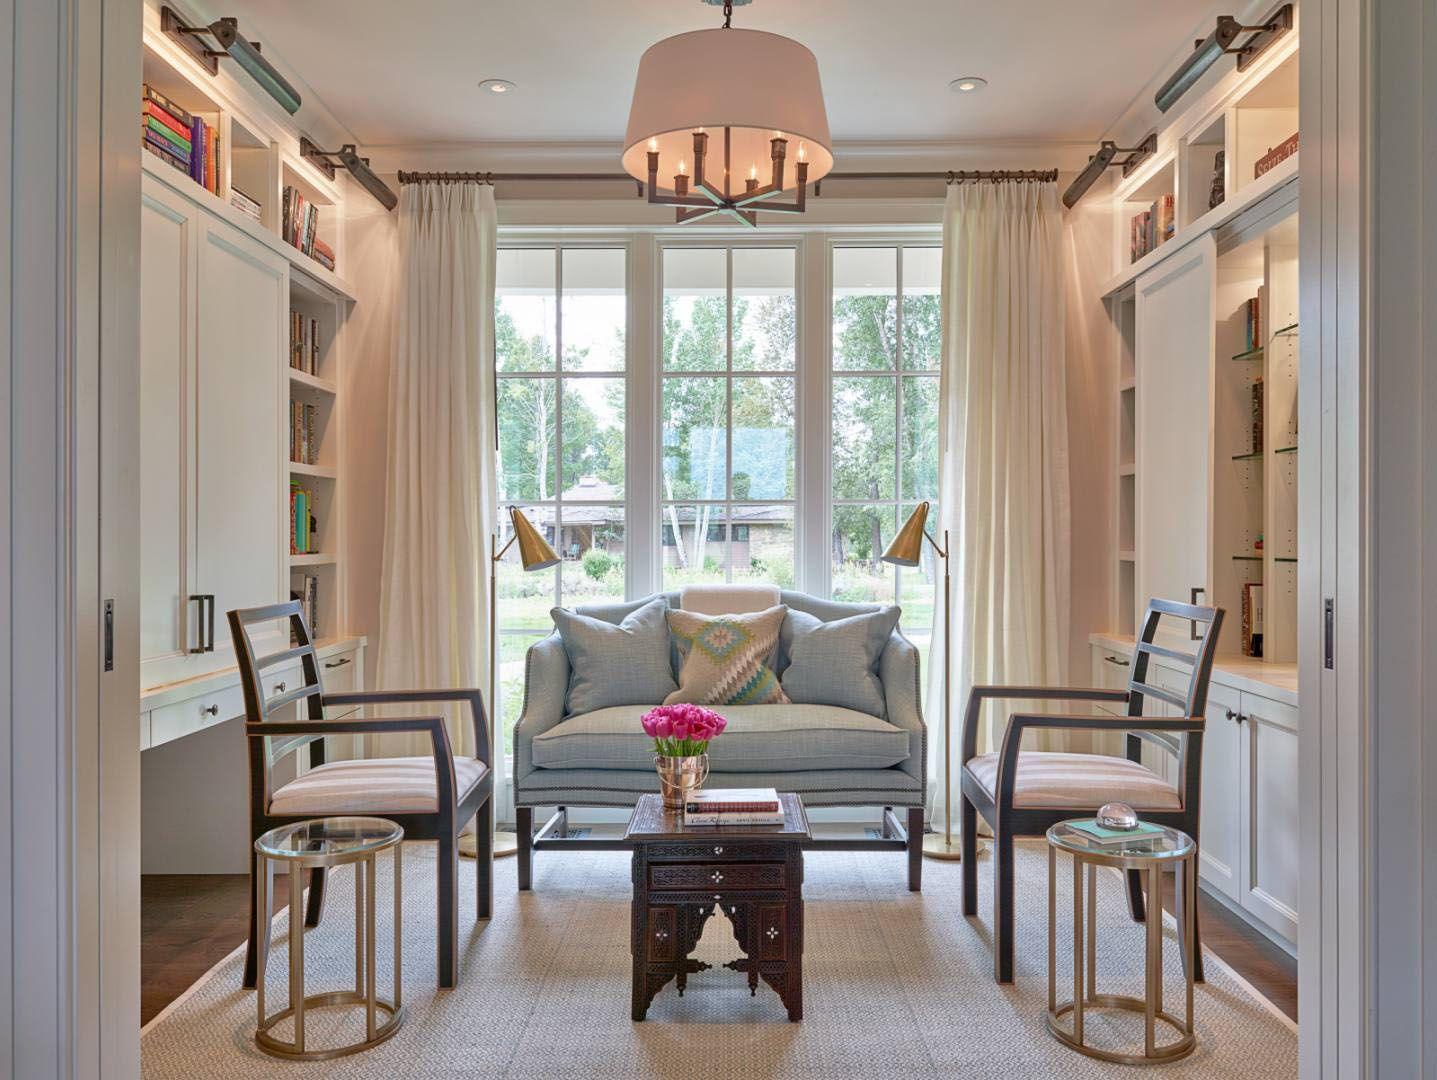 Contemporary Country Estate Decor | Interior Decor & Design ...